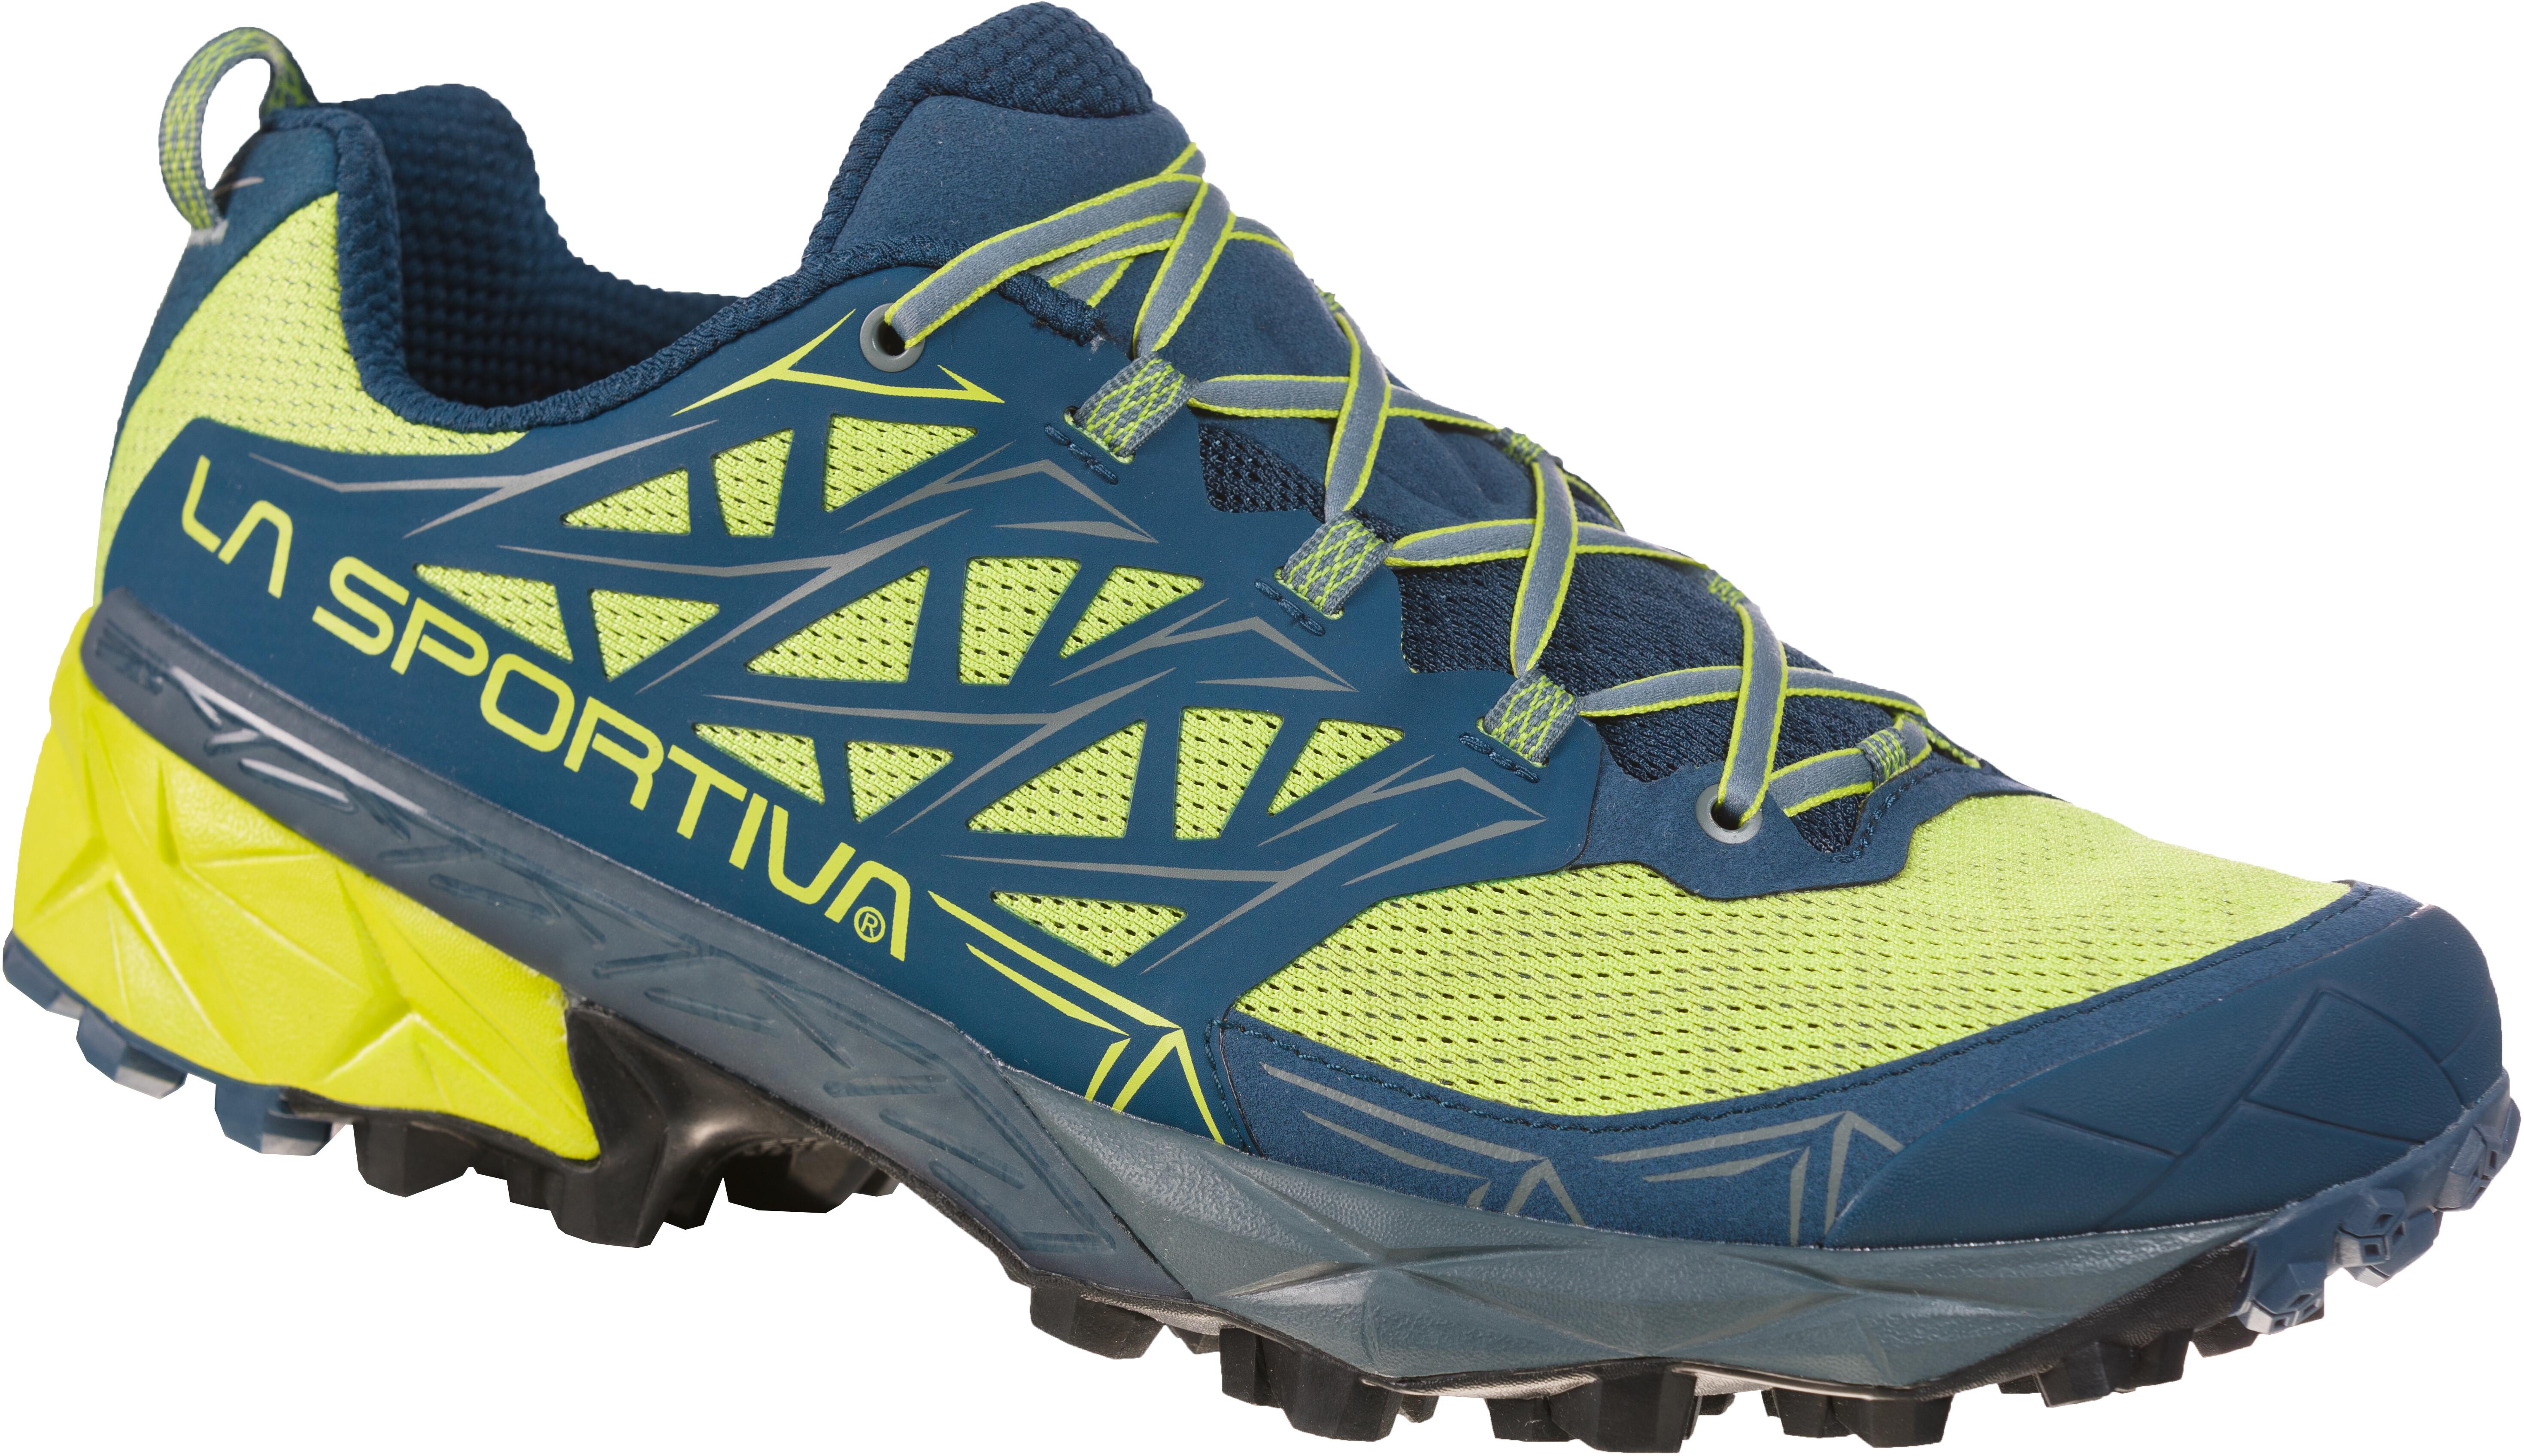 Chaussures de Trail Homme LA SPORTIVA Akyra